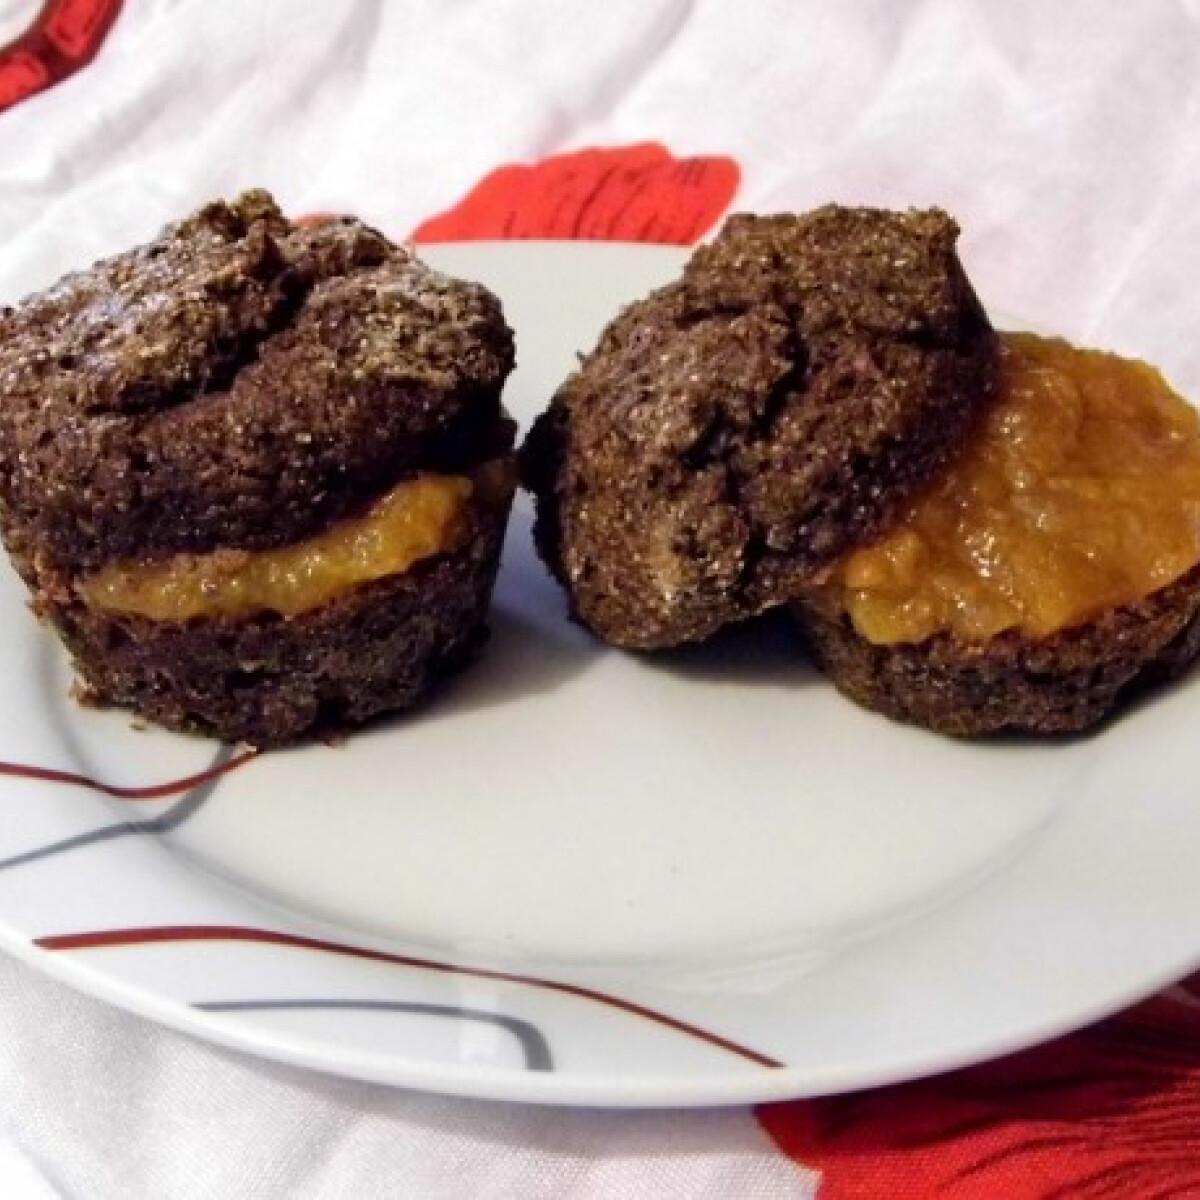 Szénhidrátcsökkentett cukormentes kakaós muffin